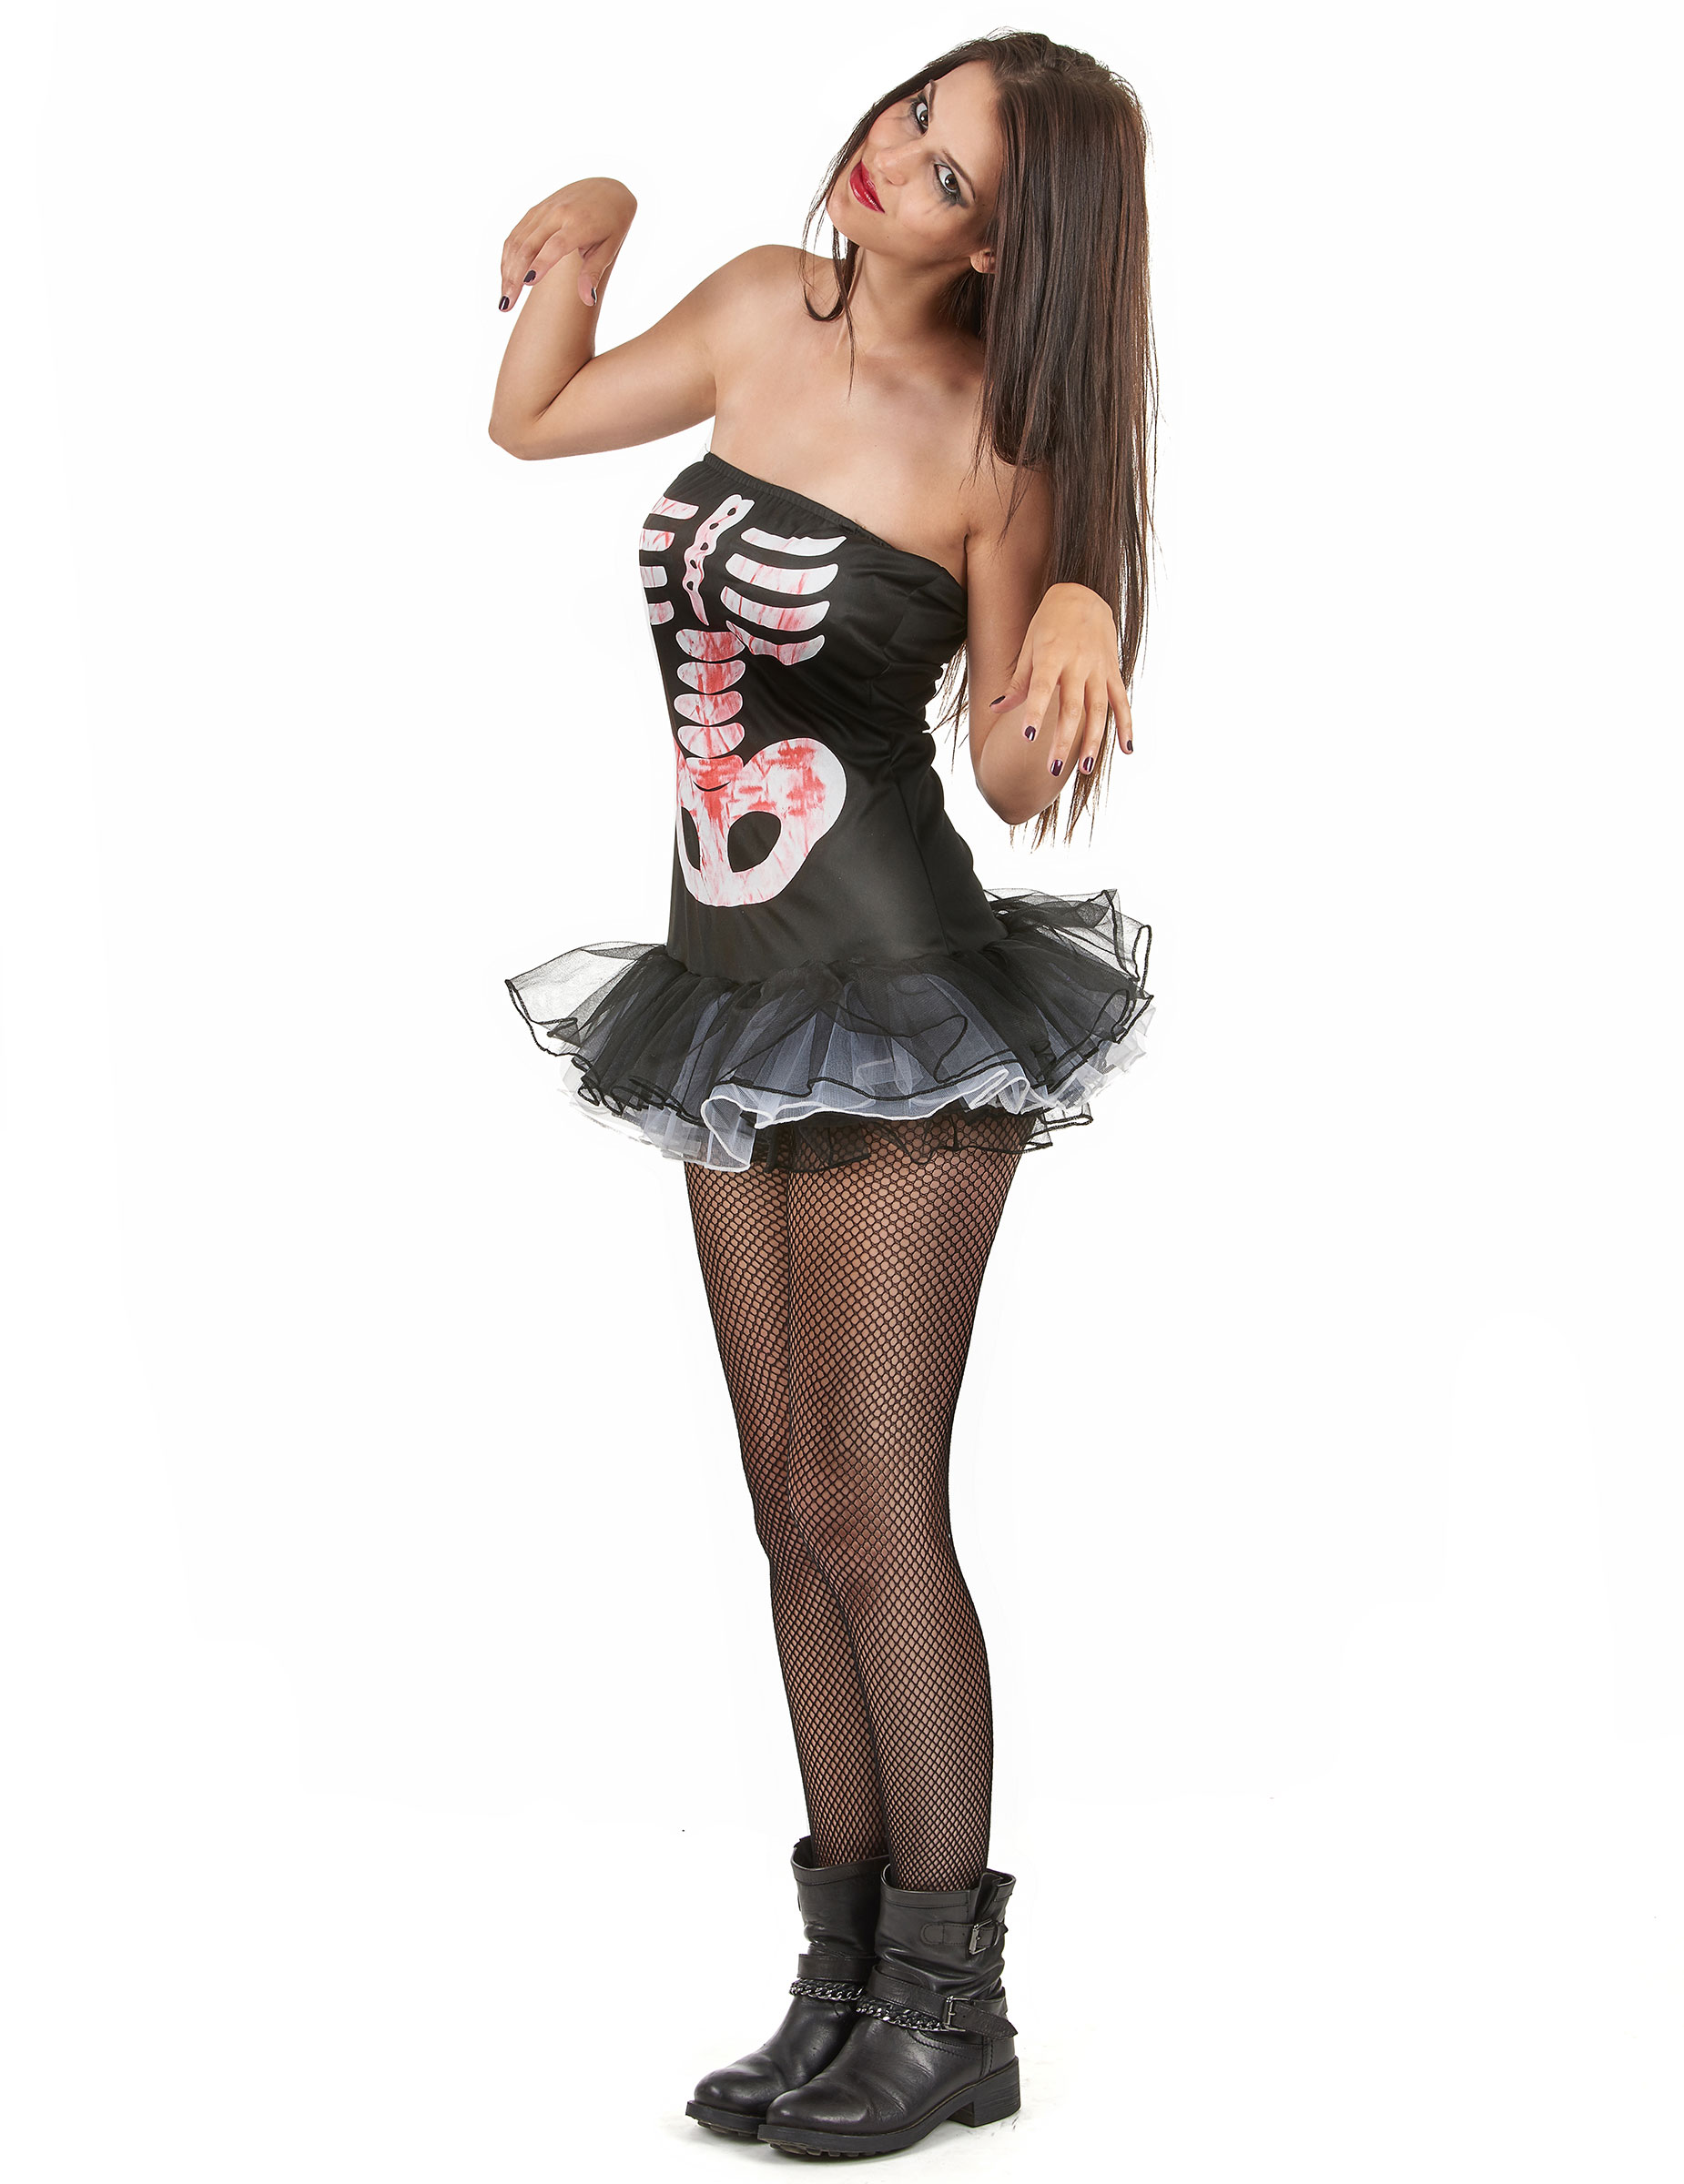 D guisement squelette sexy adulte halloween pour femme - Halloween adulte ...